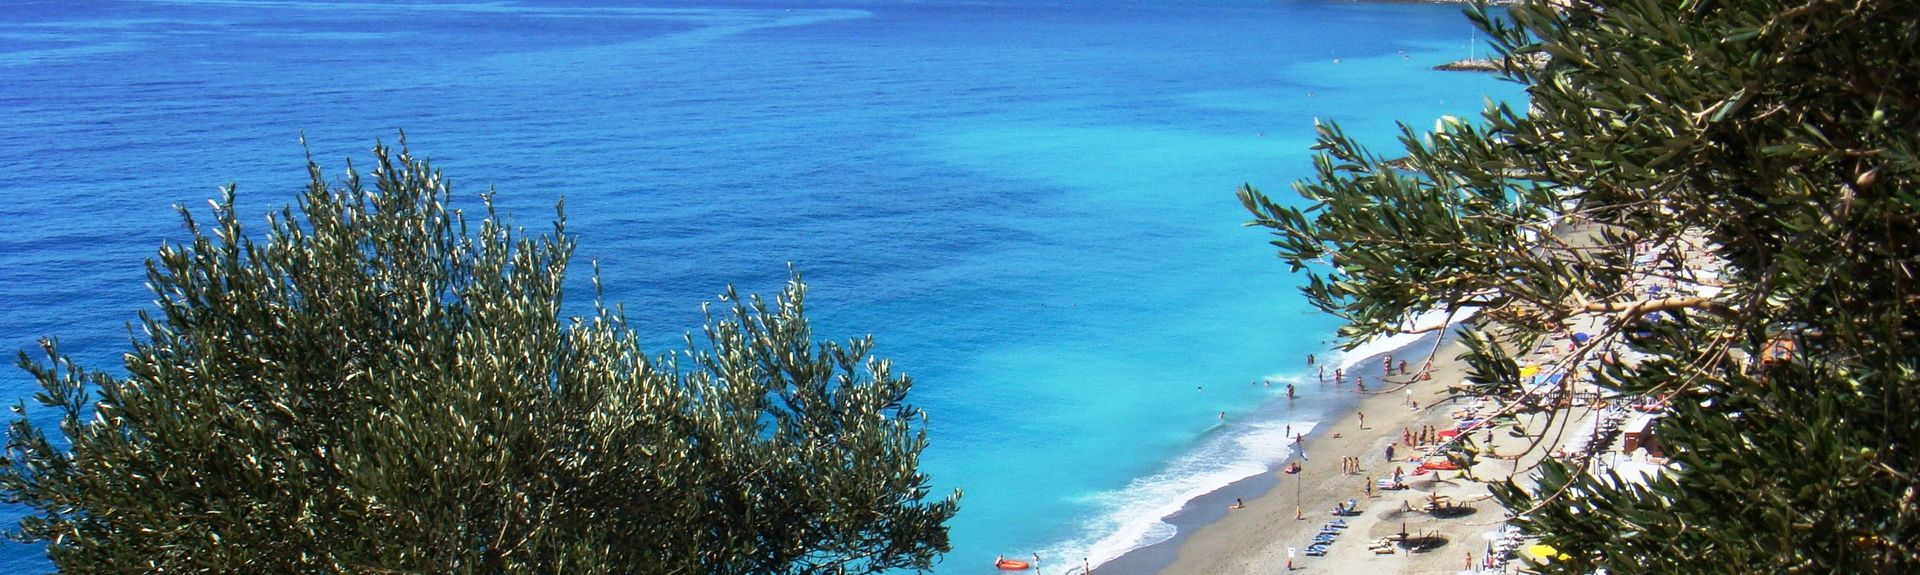 Finale Ligure, Savona, Liguria, Italy